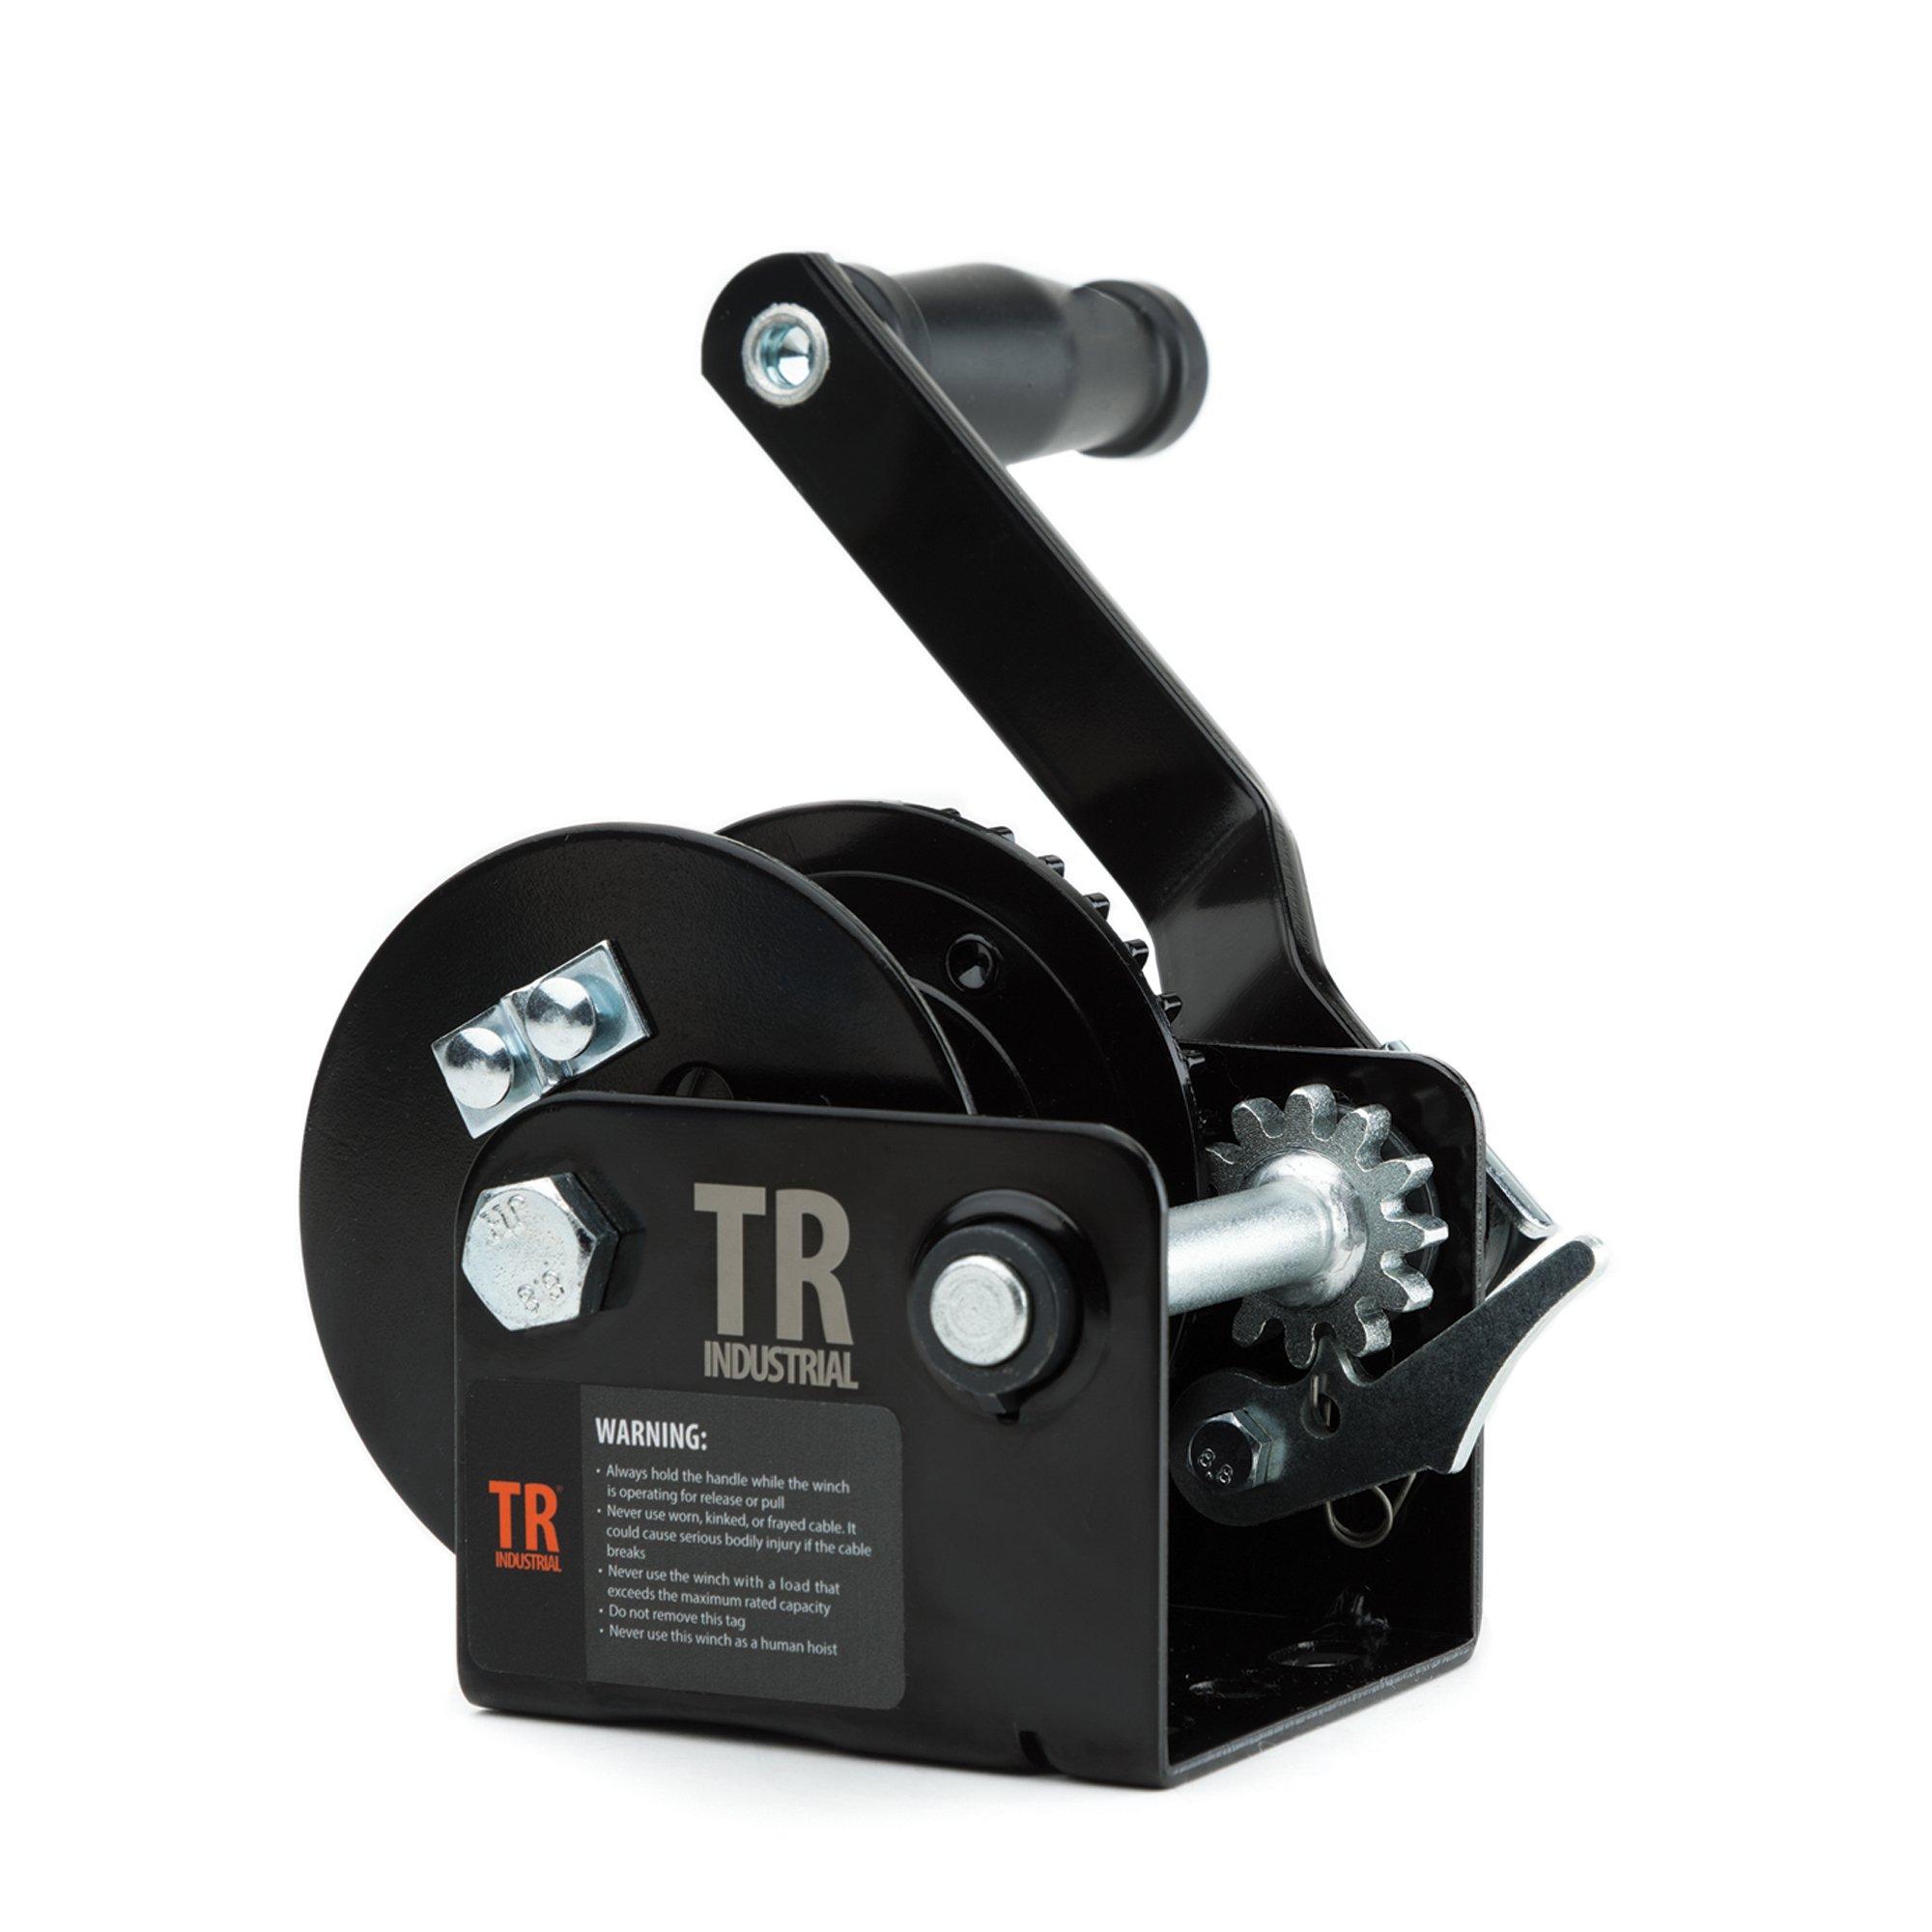 TR Industrial 600 lb. Trailer Winch